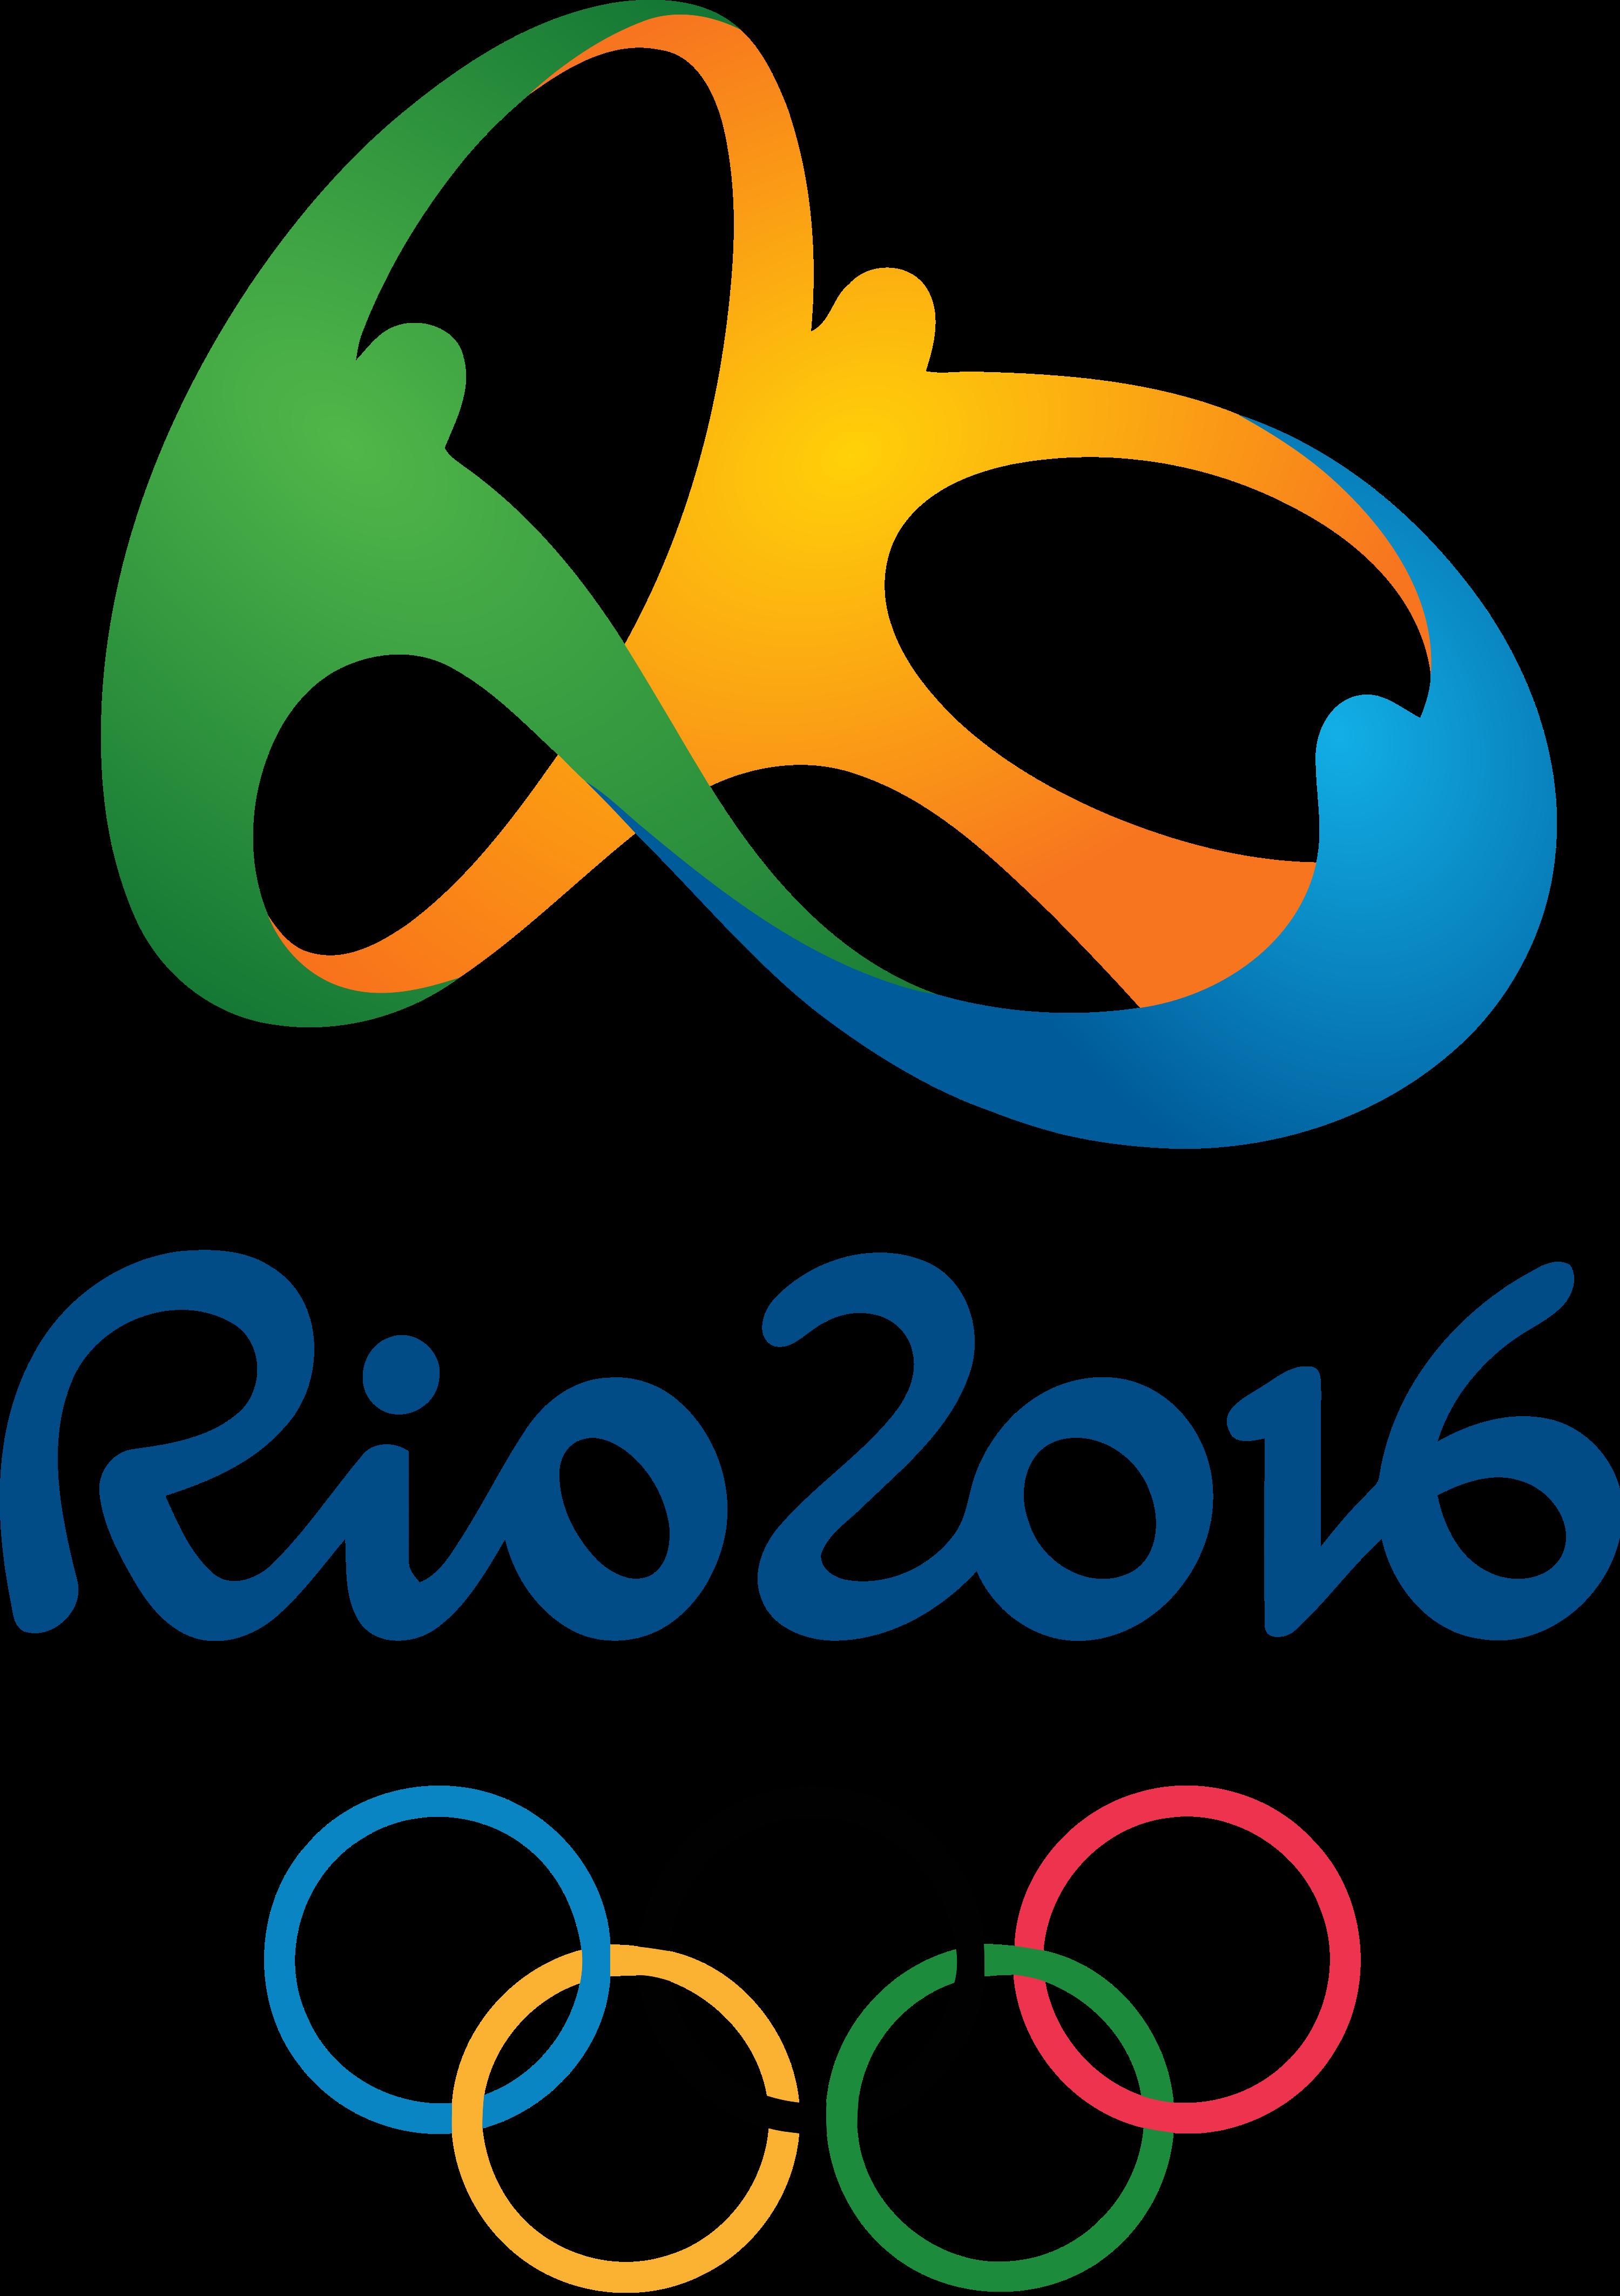 Olimpíadas Rio 2016 Logo.